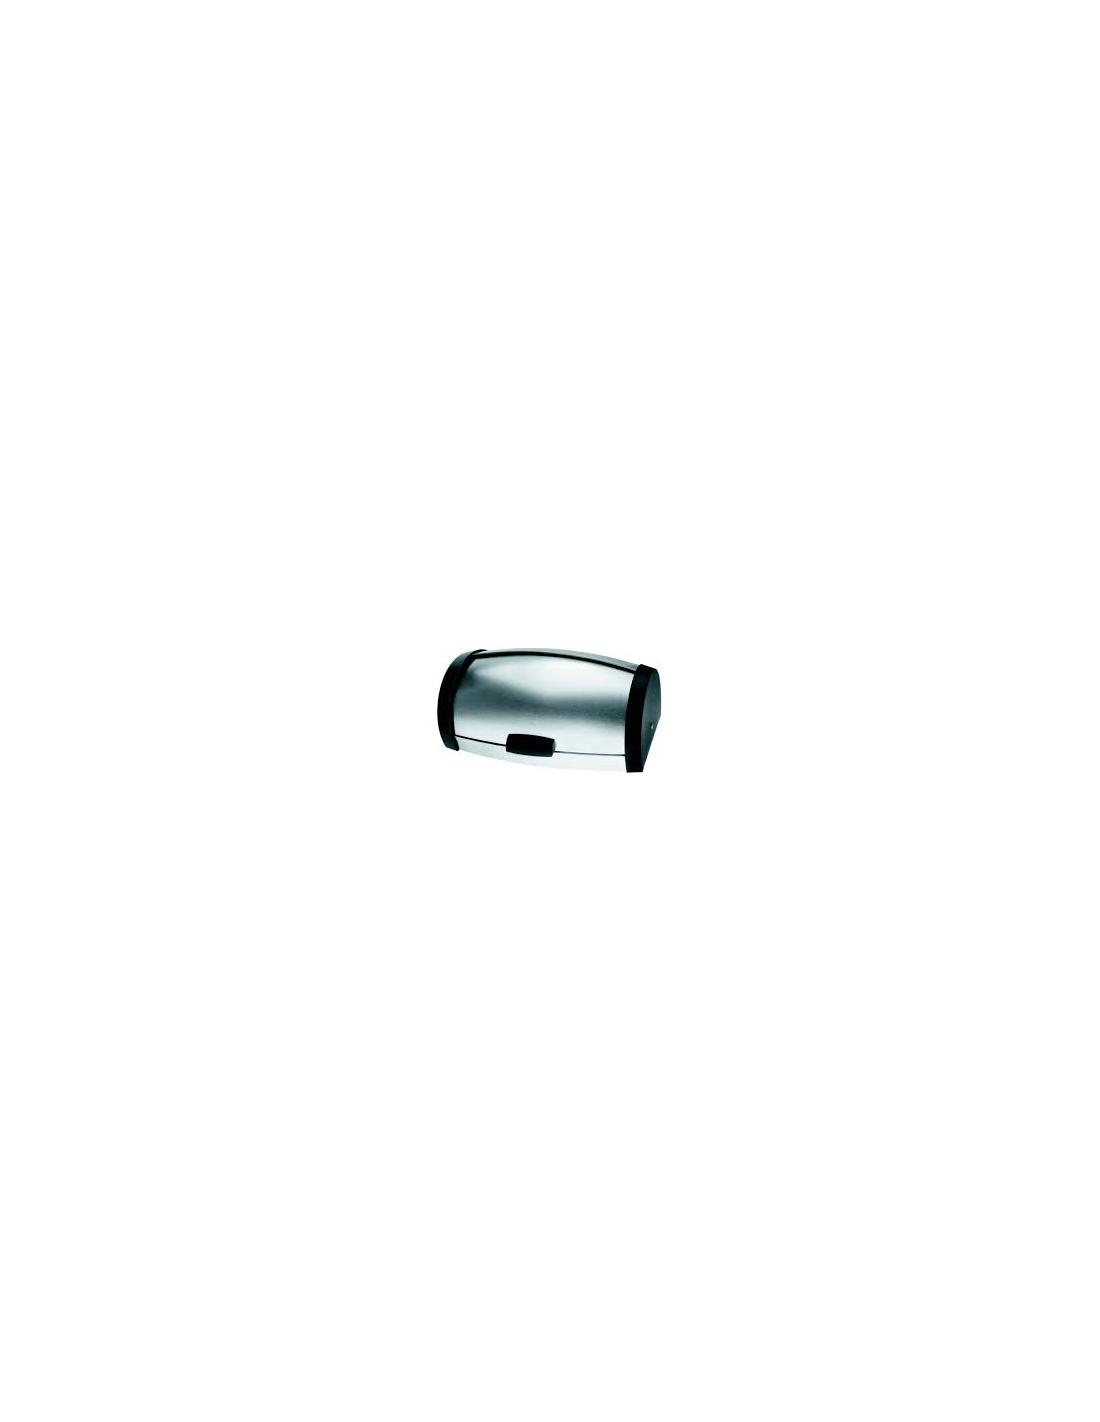 Panera abatible INOX Lacor 62944